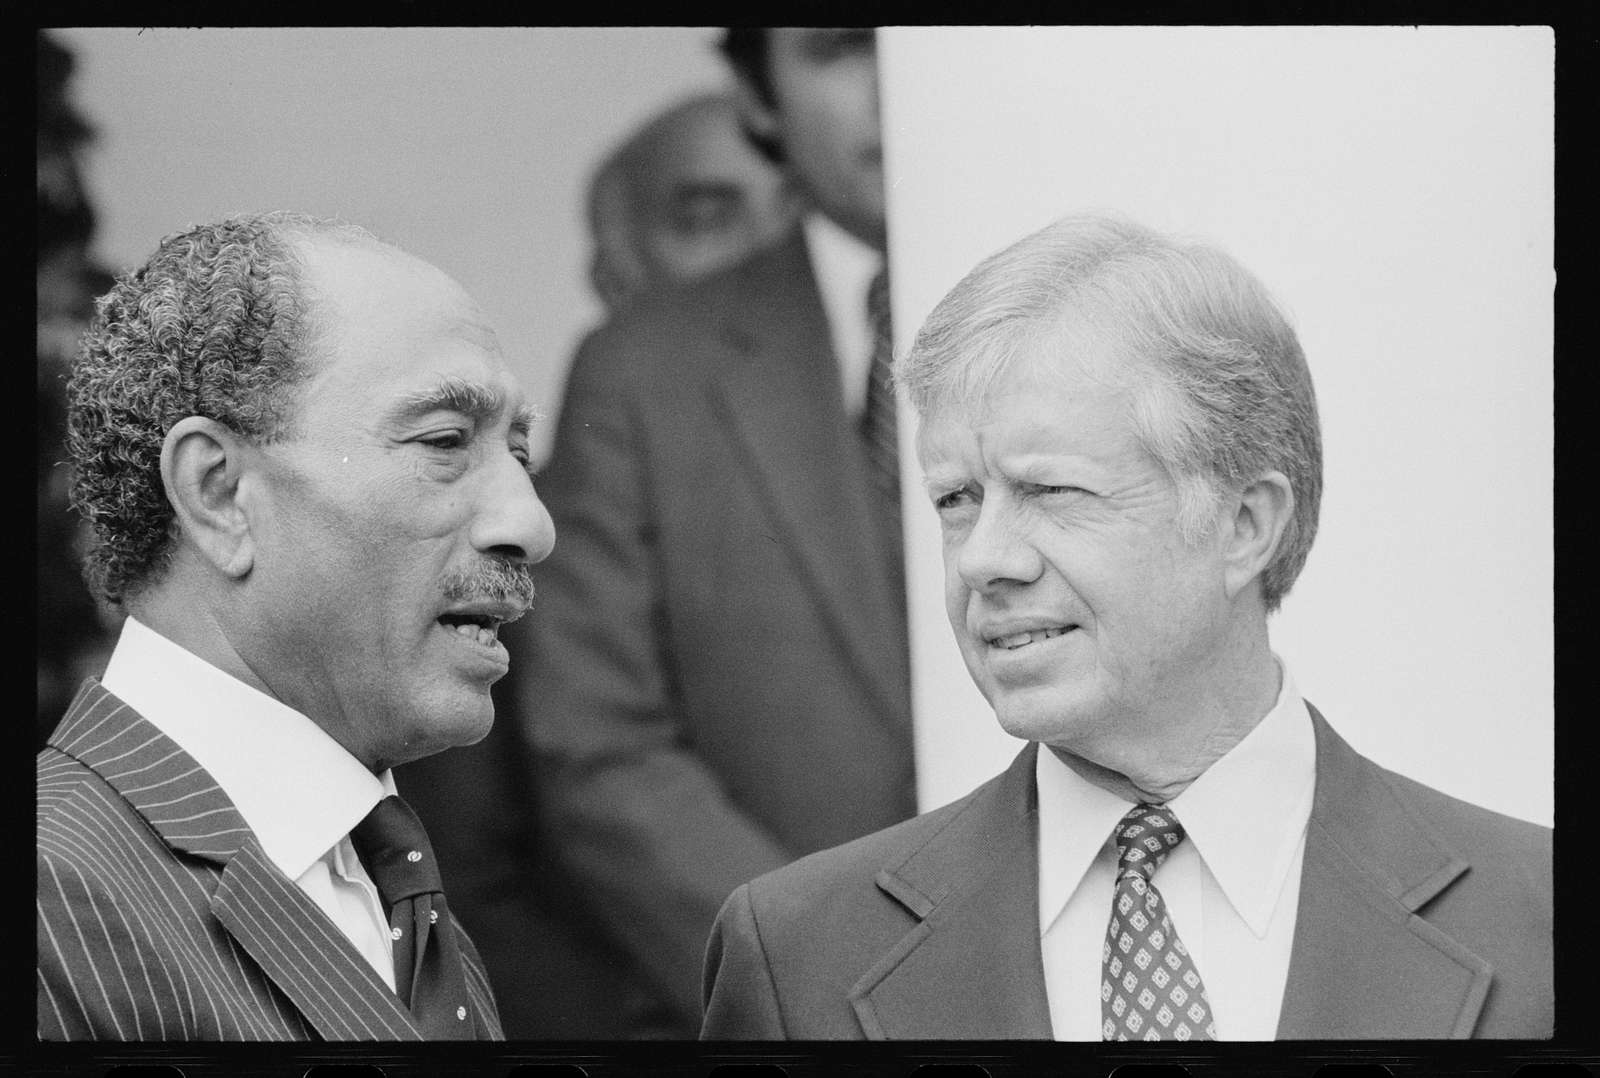 [President Jimmy Carter welcomes Egyptian President Anwar Sadat at the White House, Washington, D.C.]